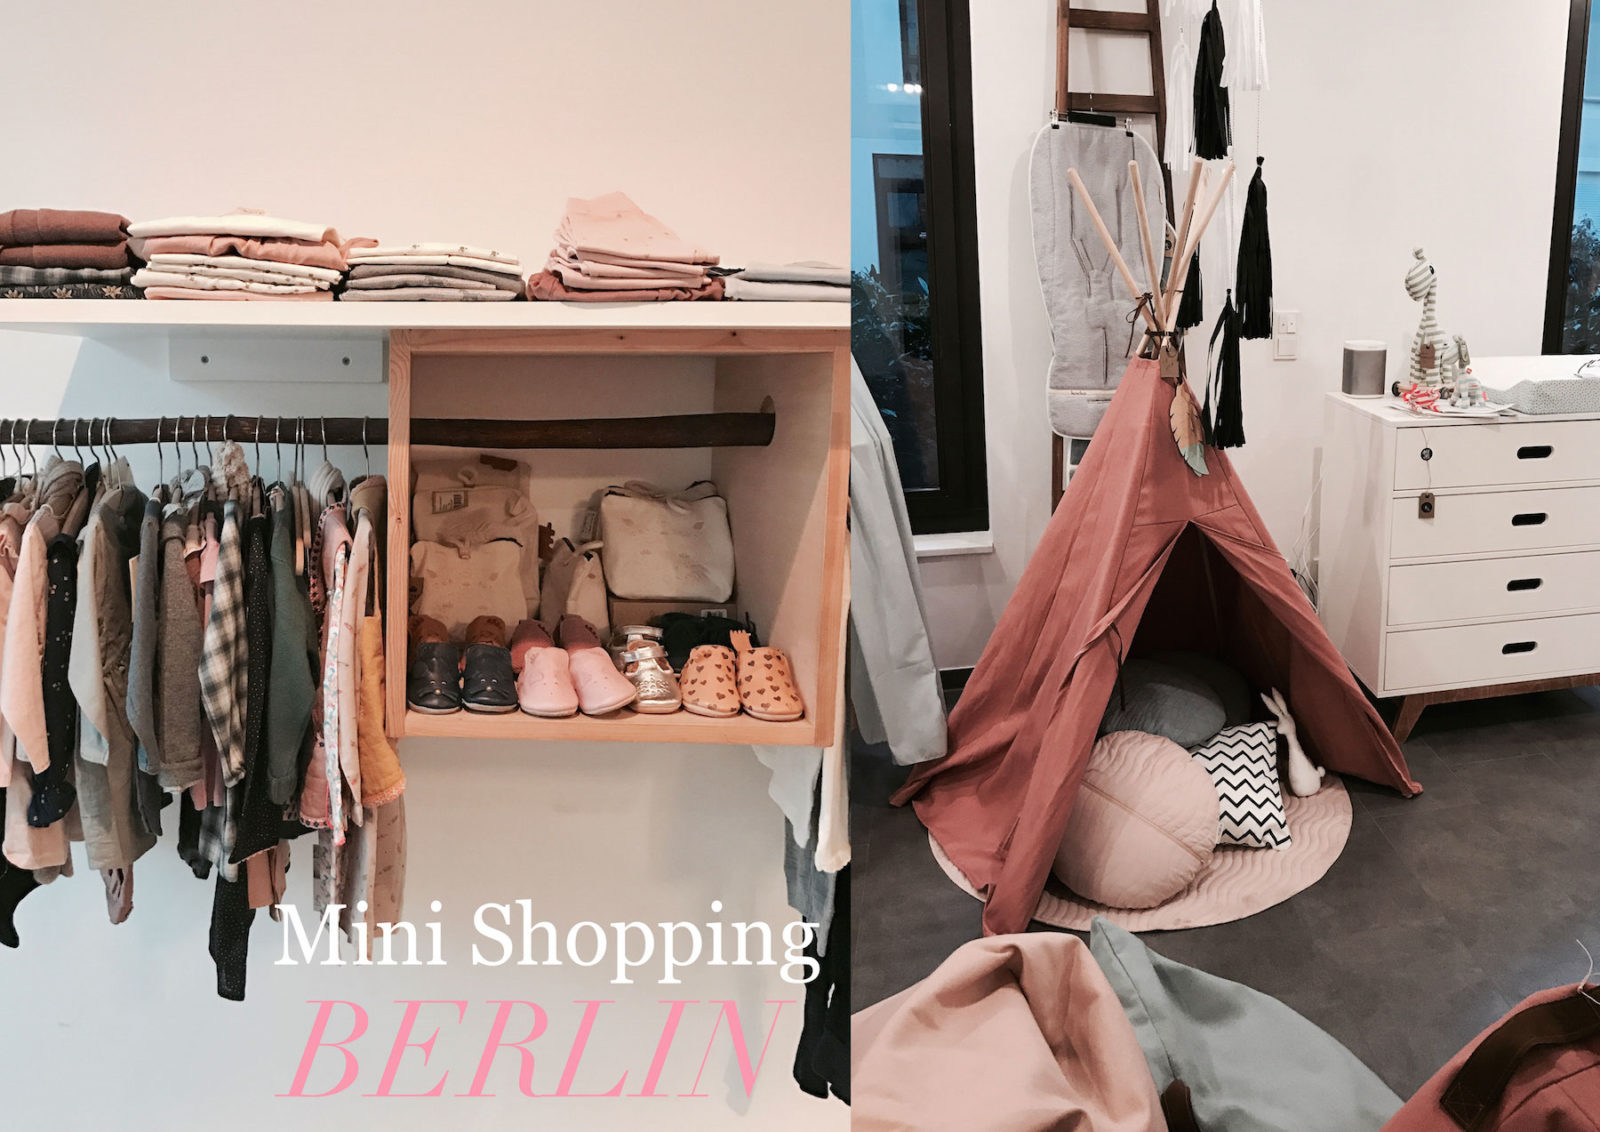 Kleider shoppen in berlin